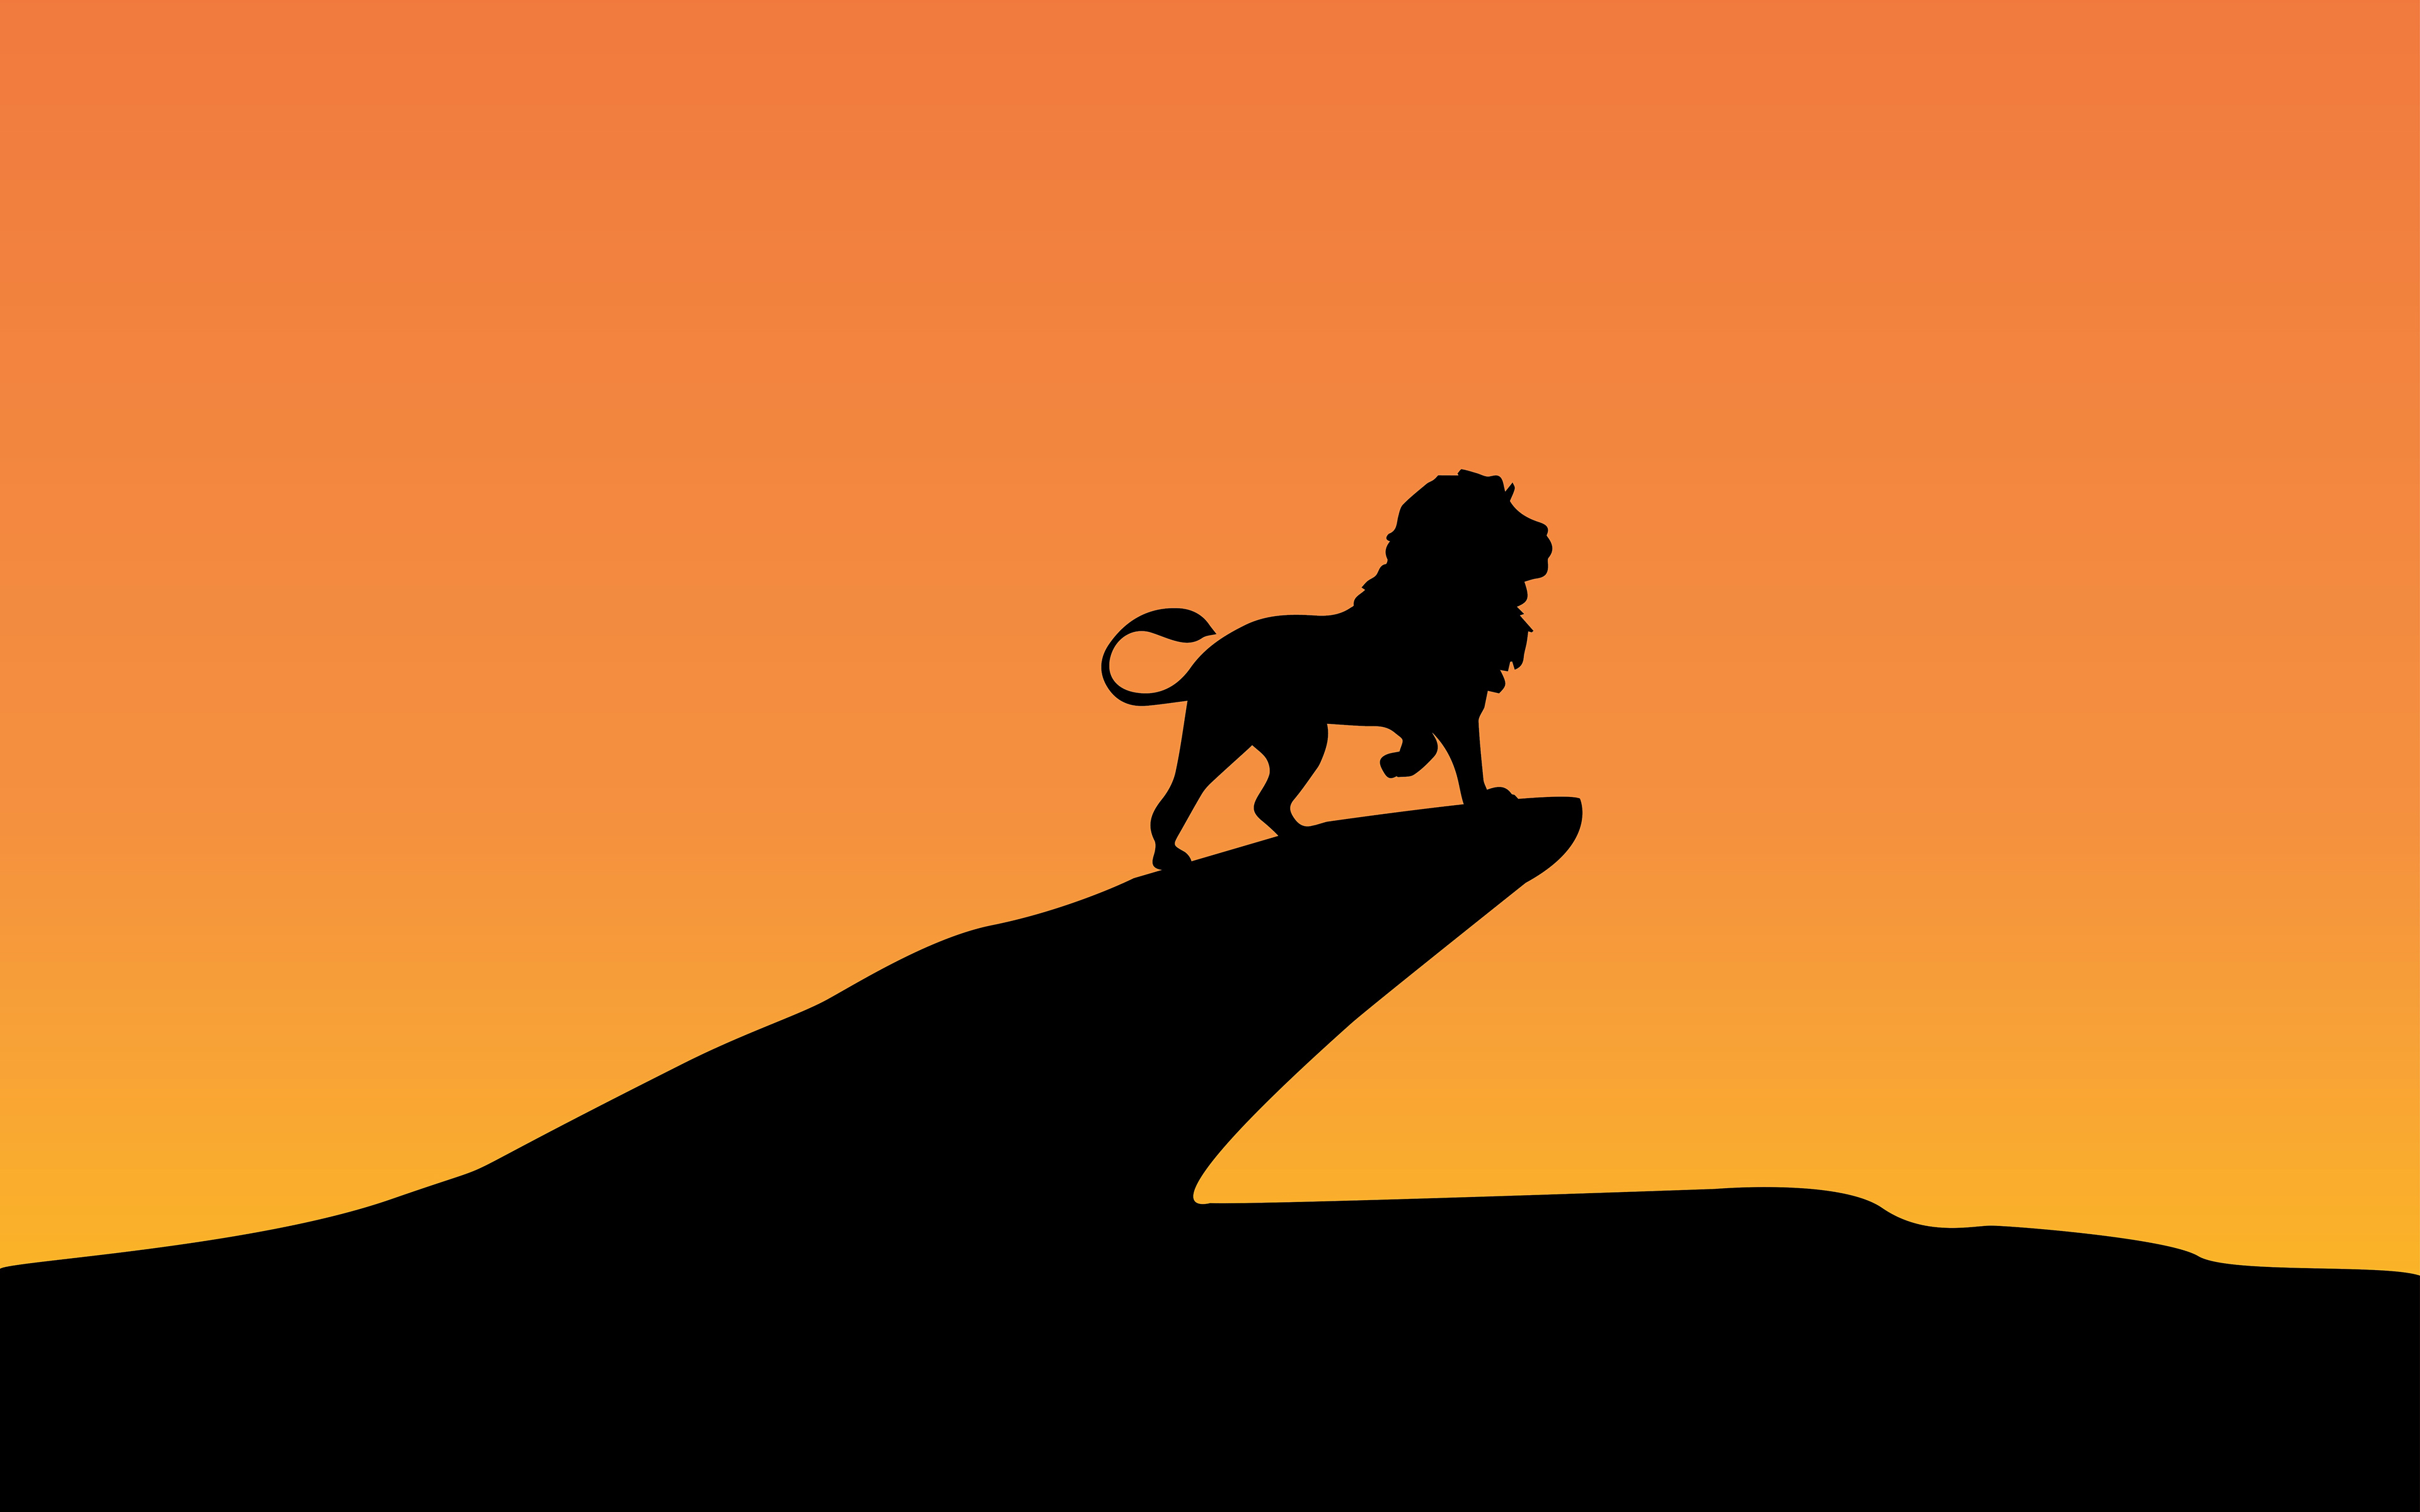 Lion King Silhouette Minimal 4k 8k Wallpapers Hd Wallpapers